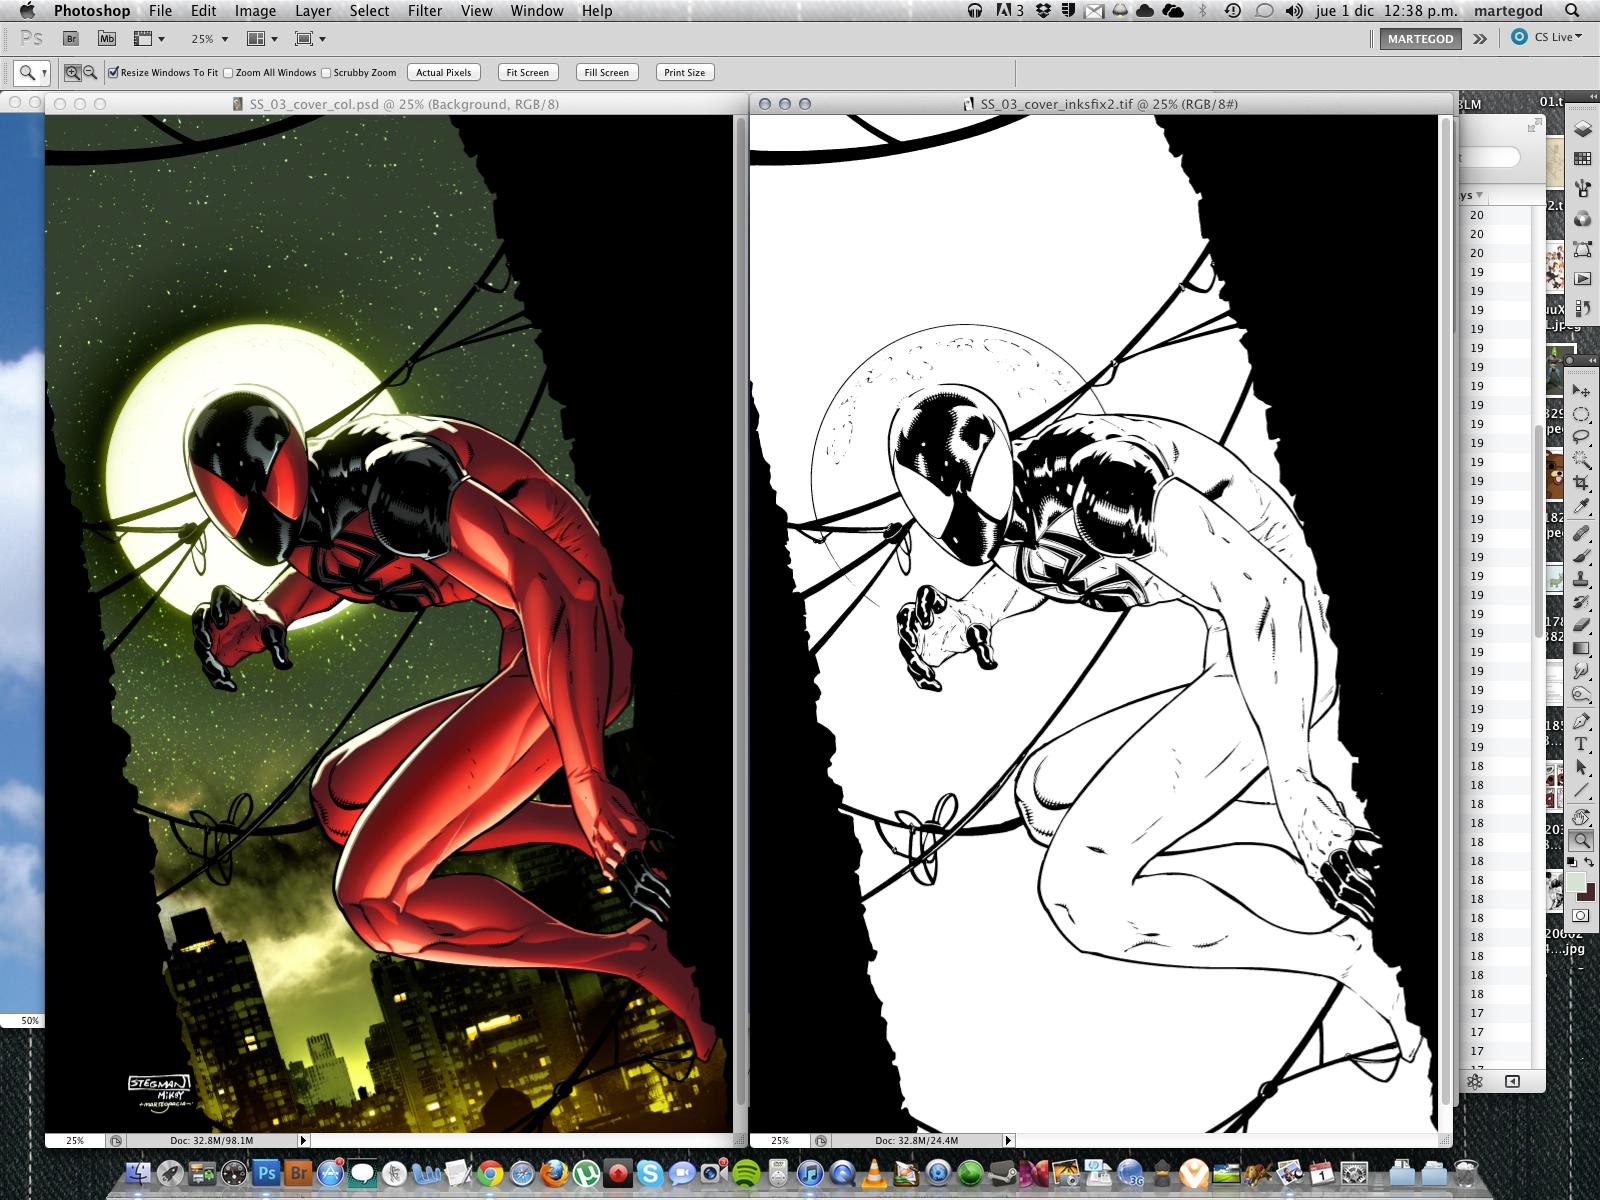 Marvel 2012 Scarlet Spider 03 Cover by MarteGracia